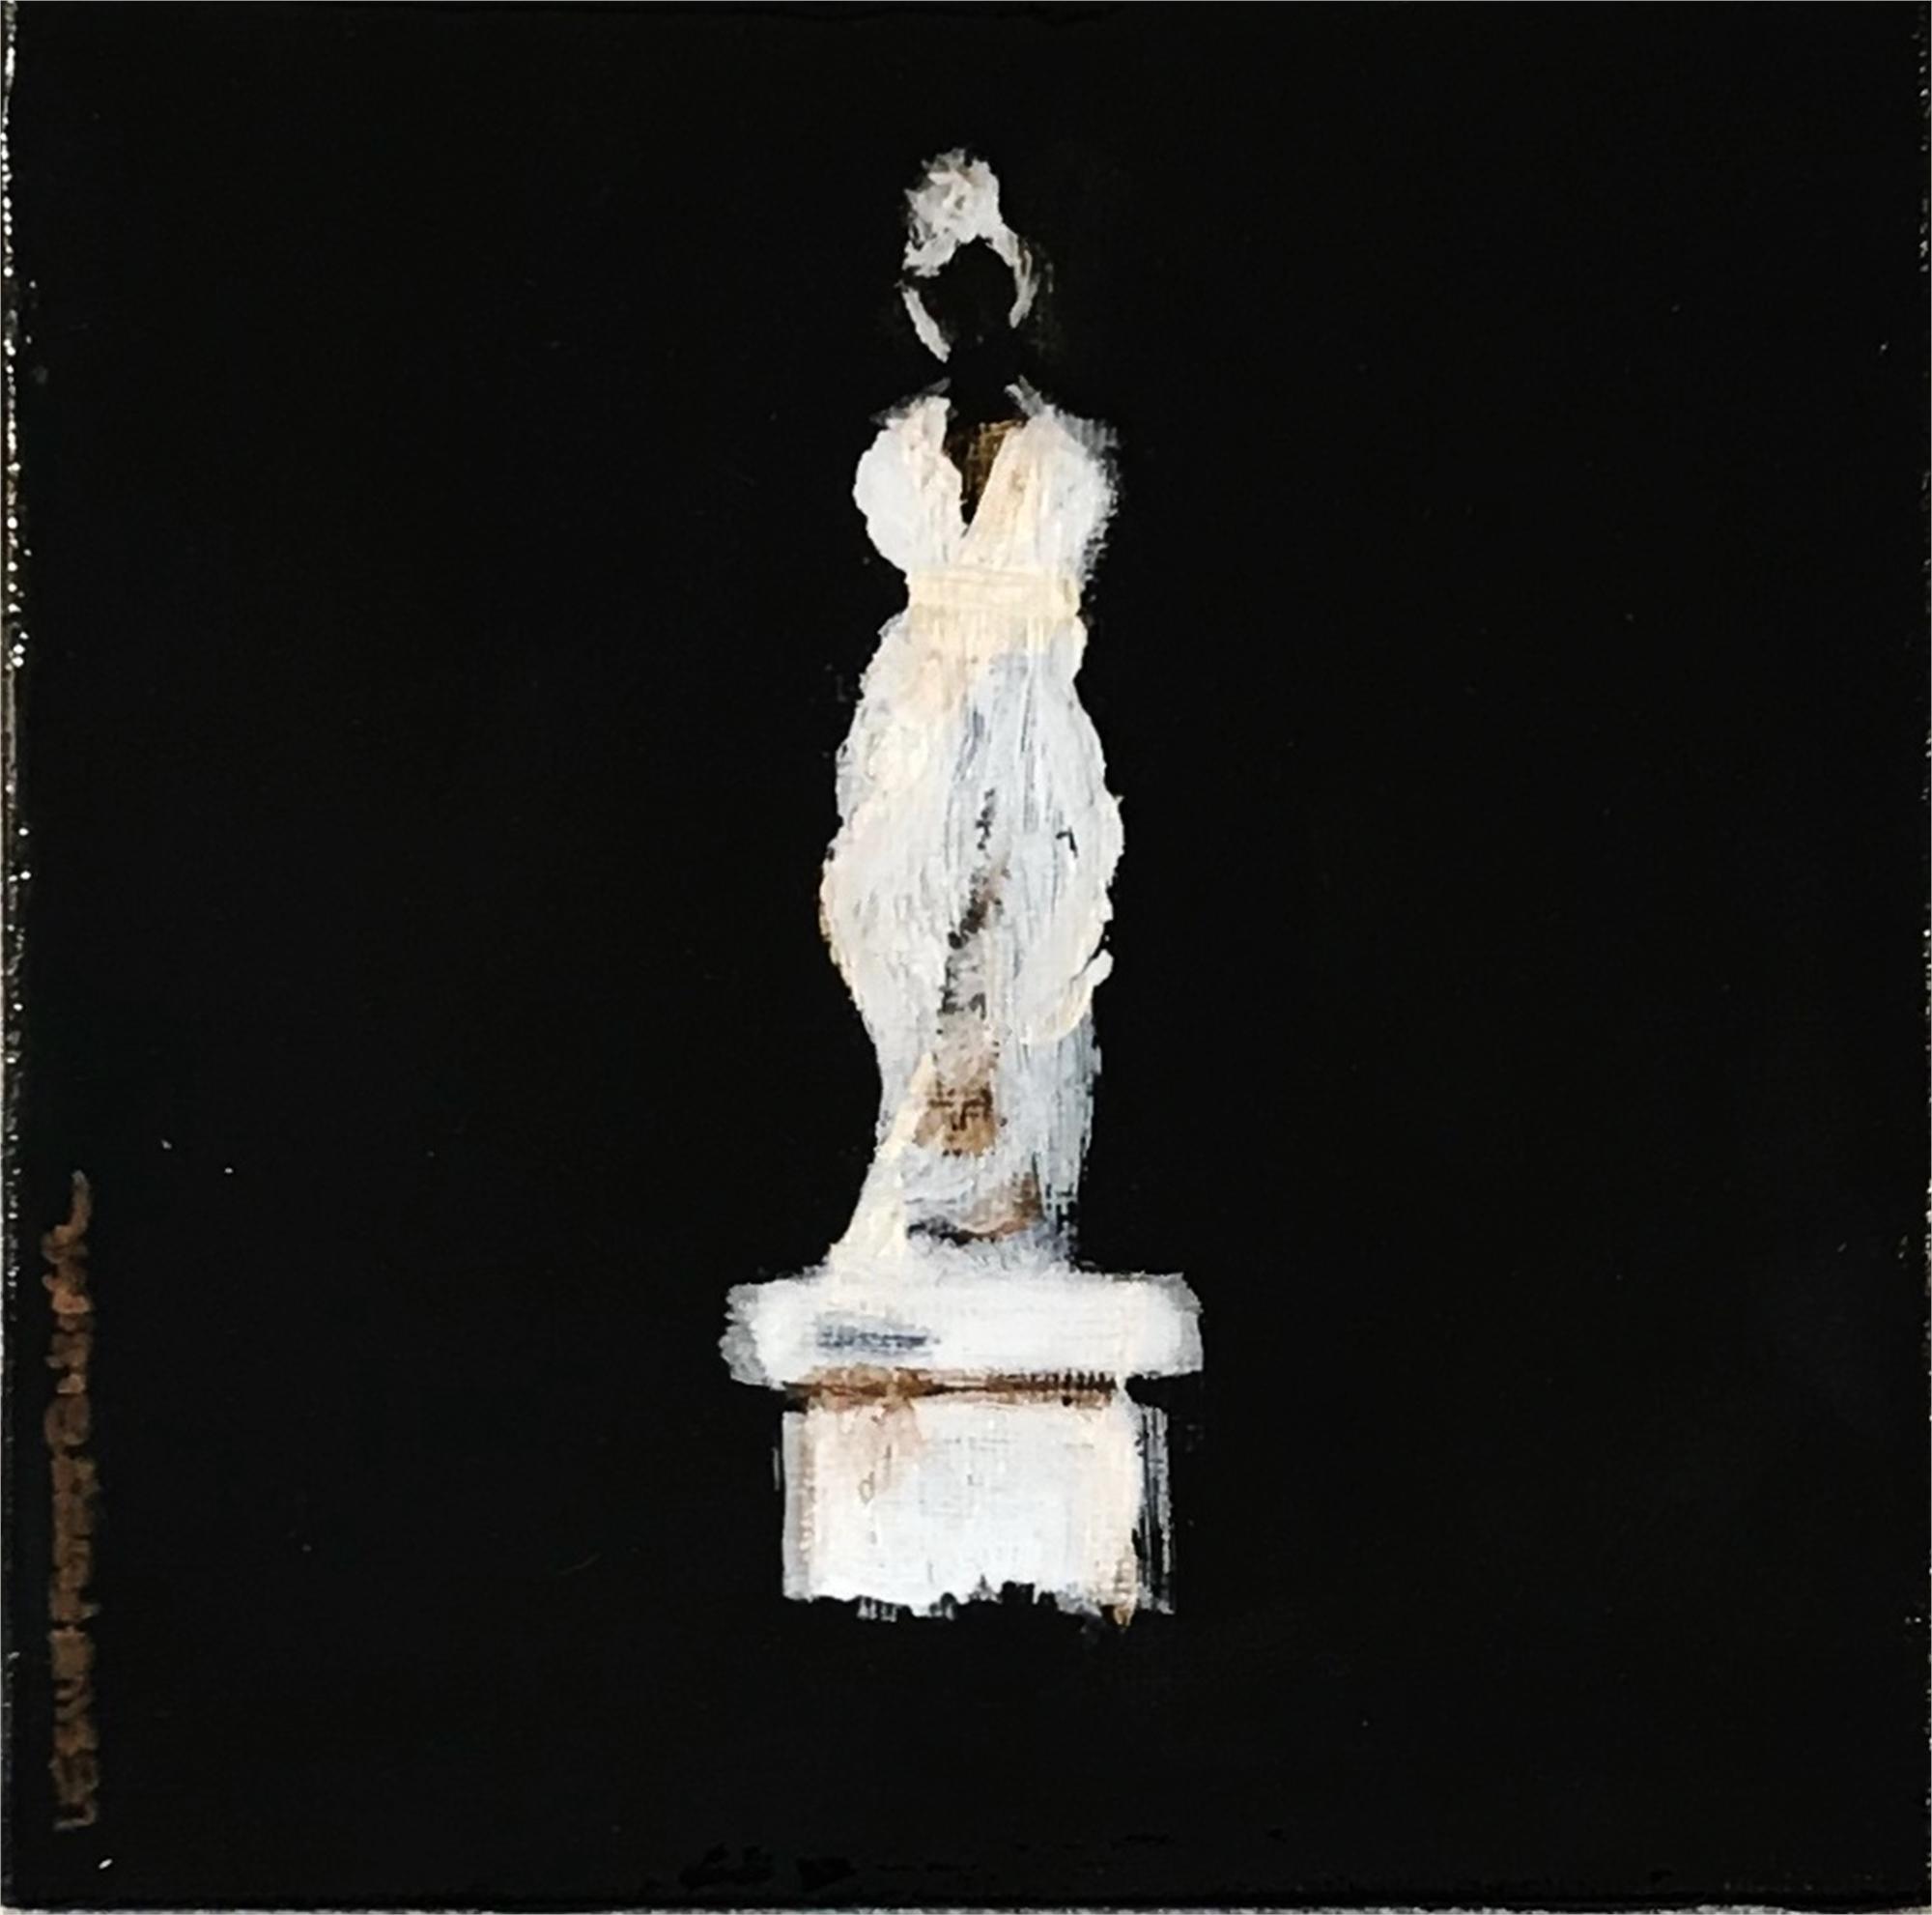 Statuesque IV by Leslie Poteet Busker